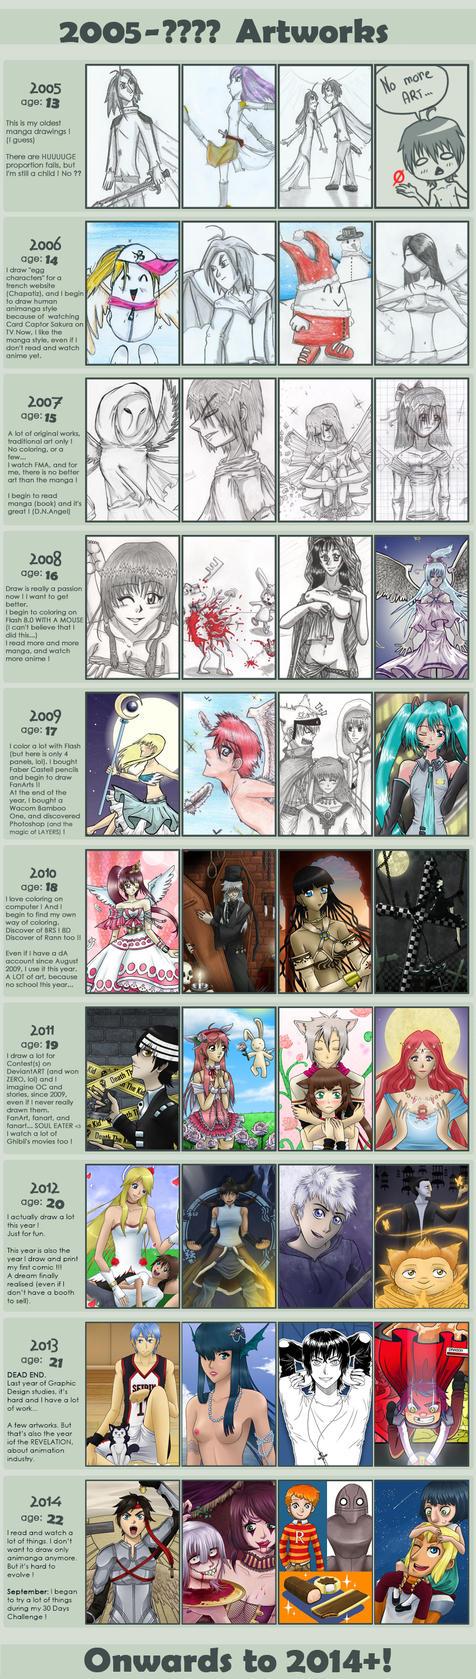 Improvement Meme 2005-2014 by Clampy-TFA